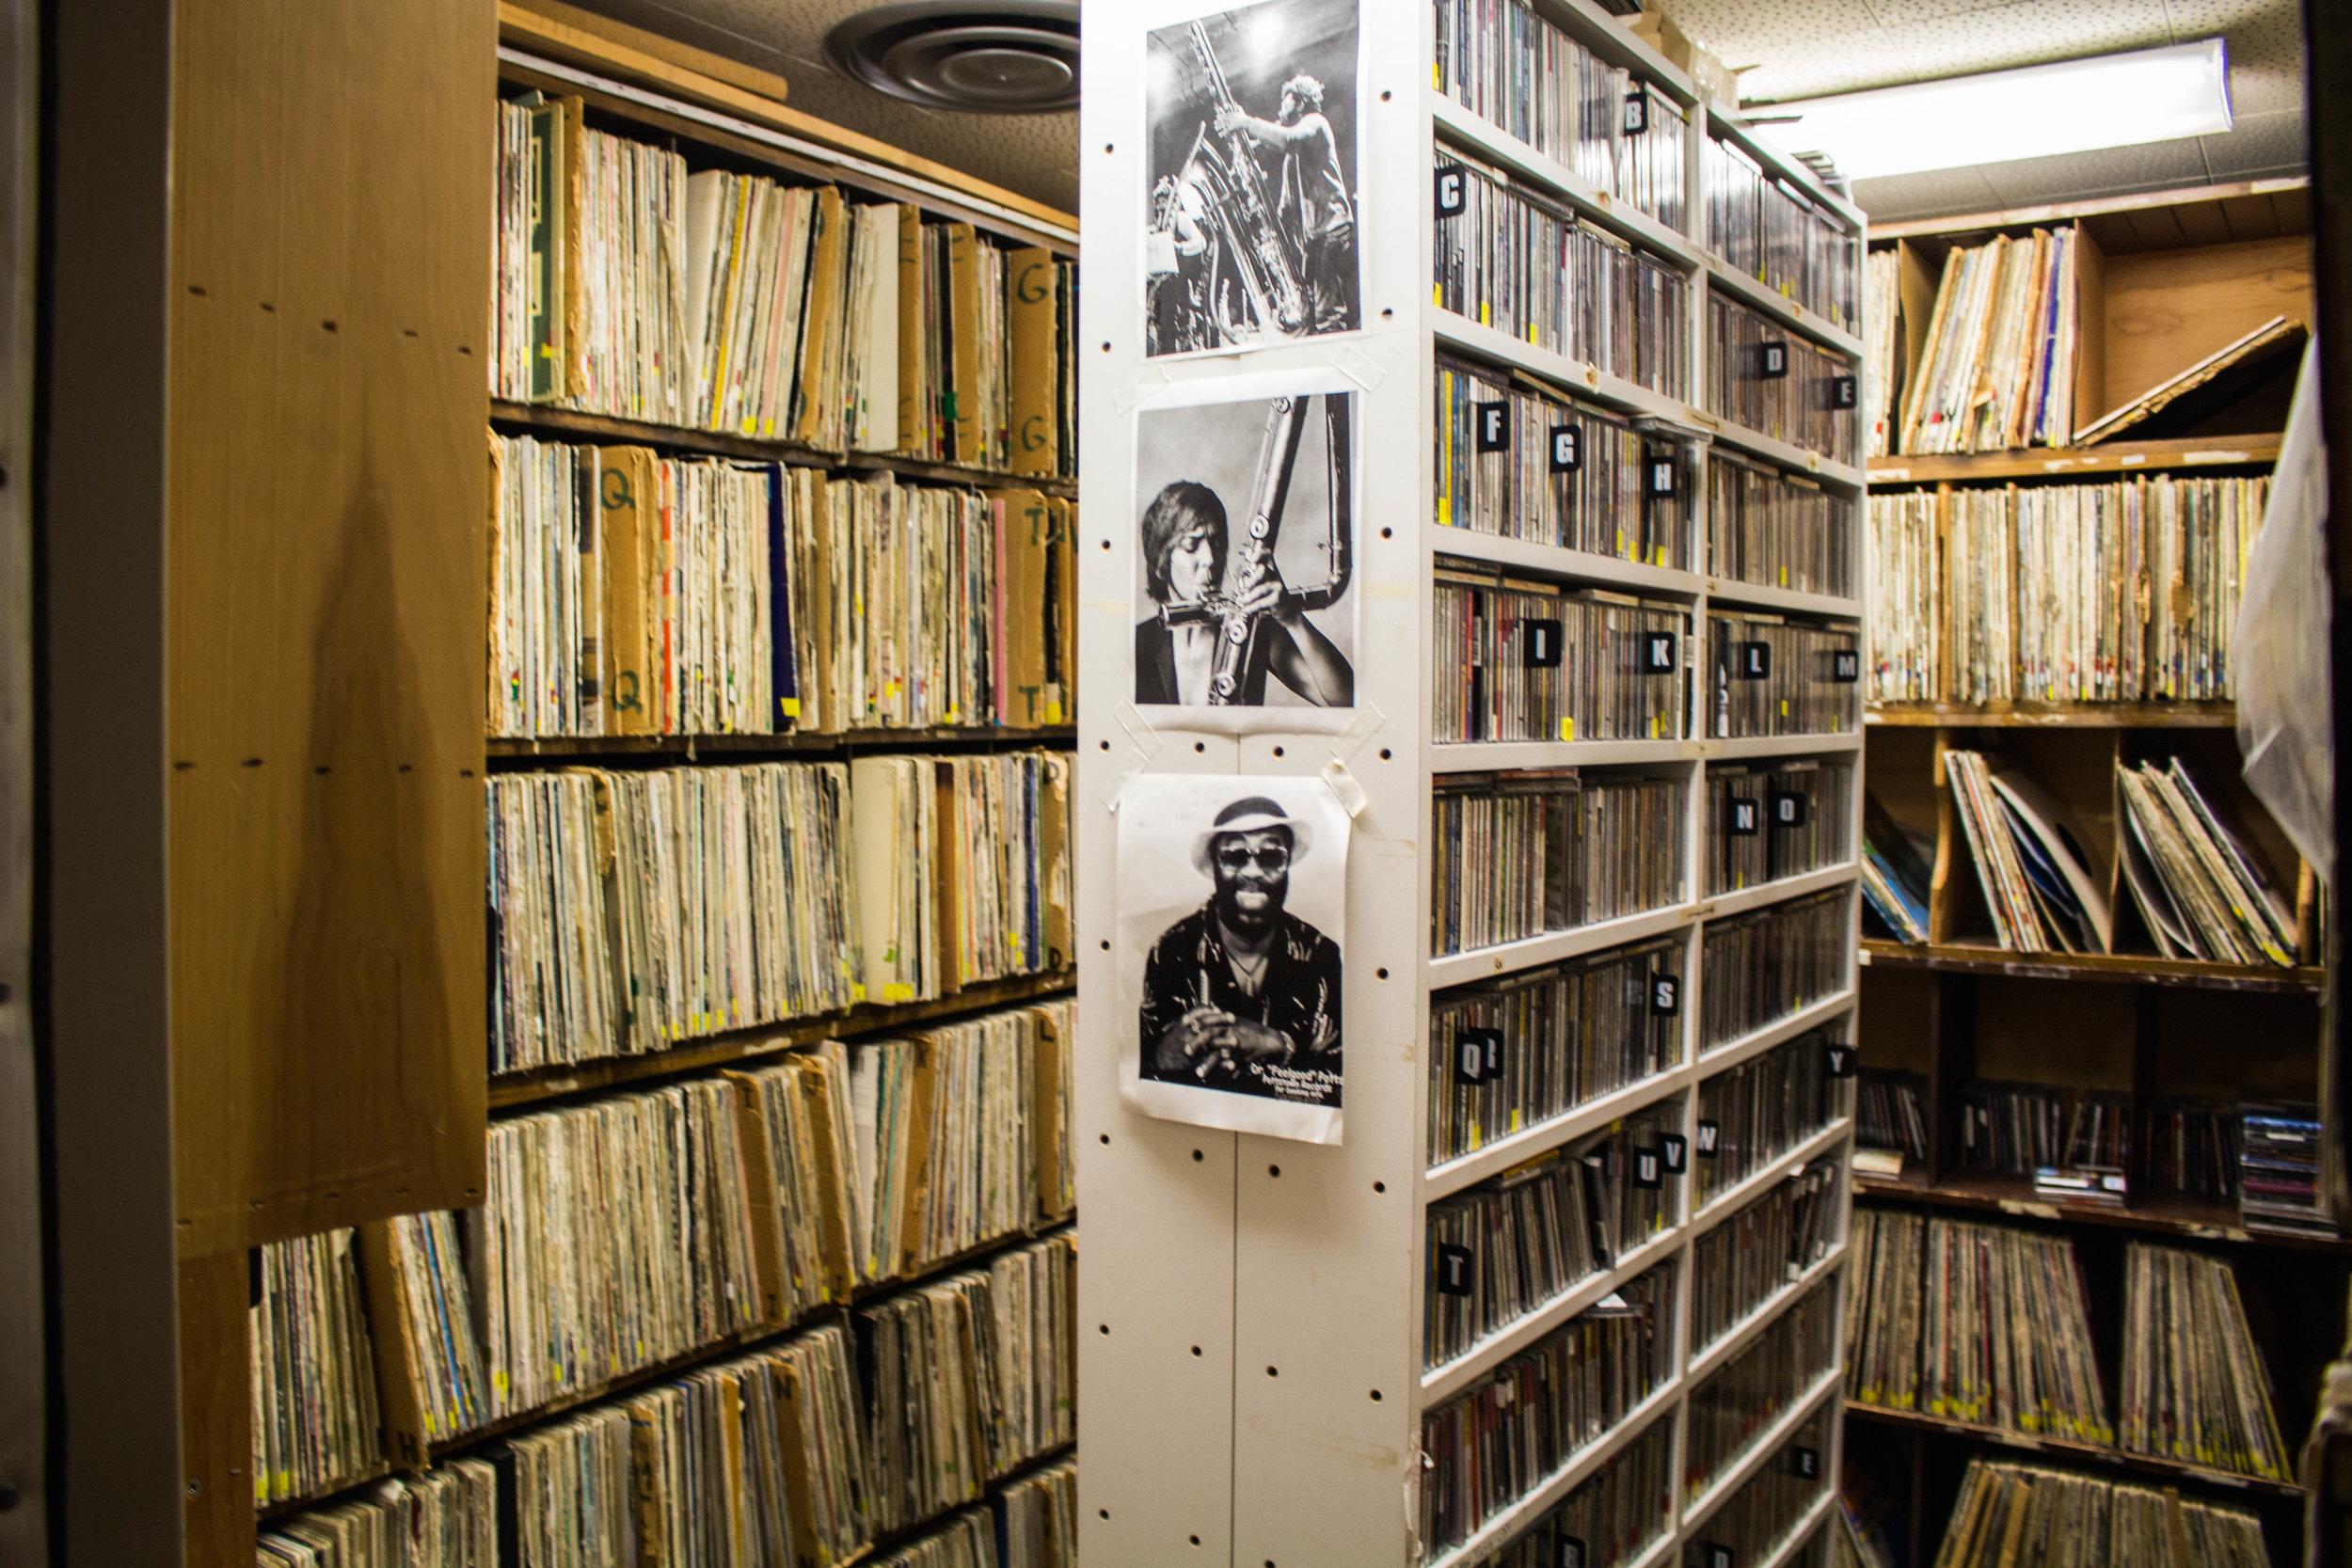 Storage room holding vinyl records in the KUMD studio. Photo by Justin Flesher